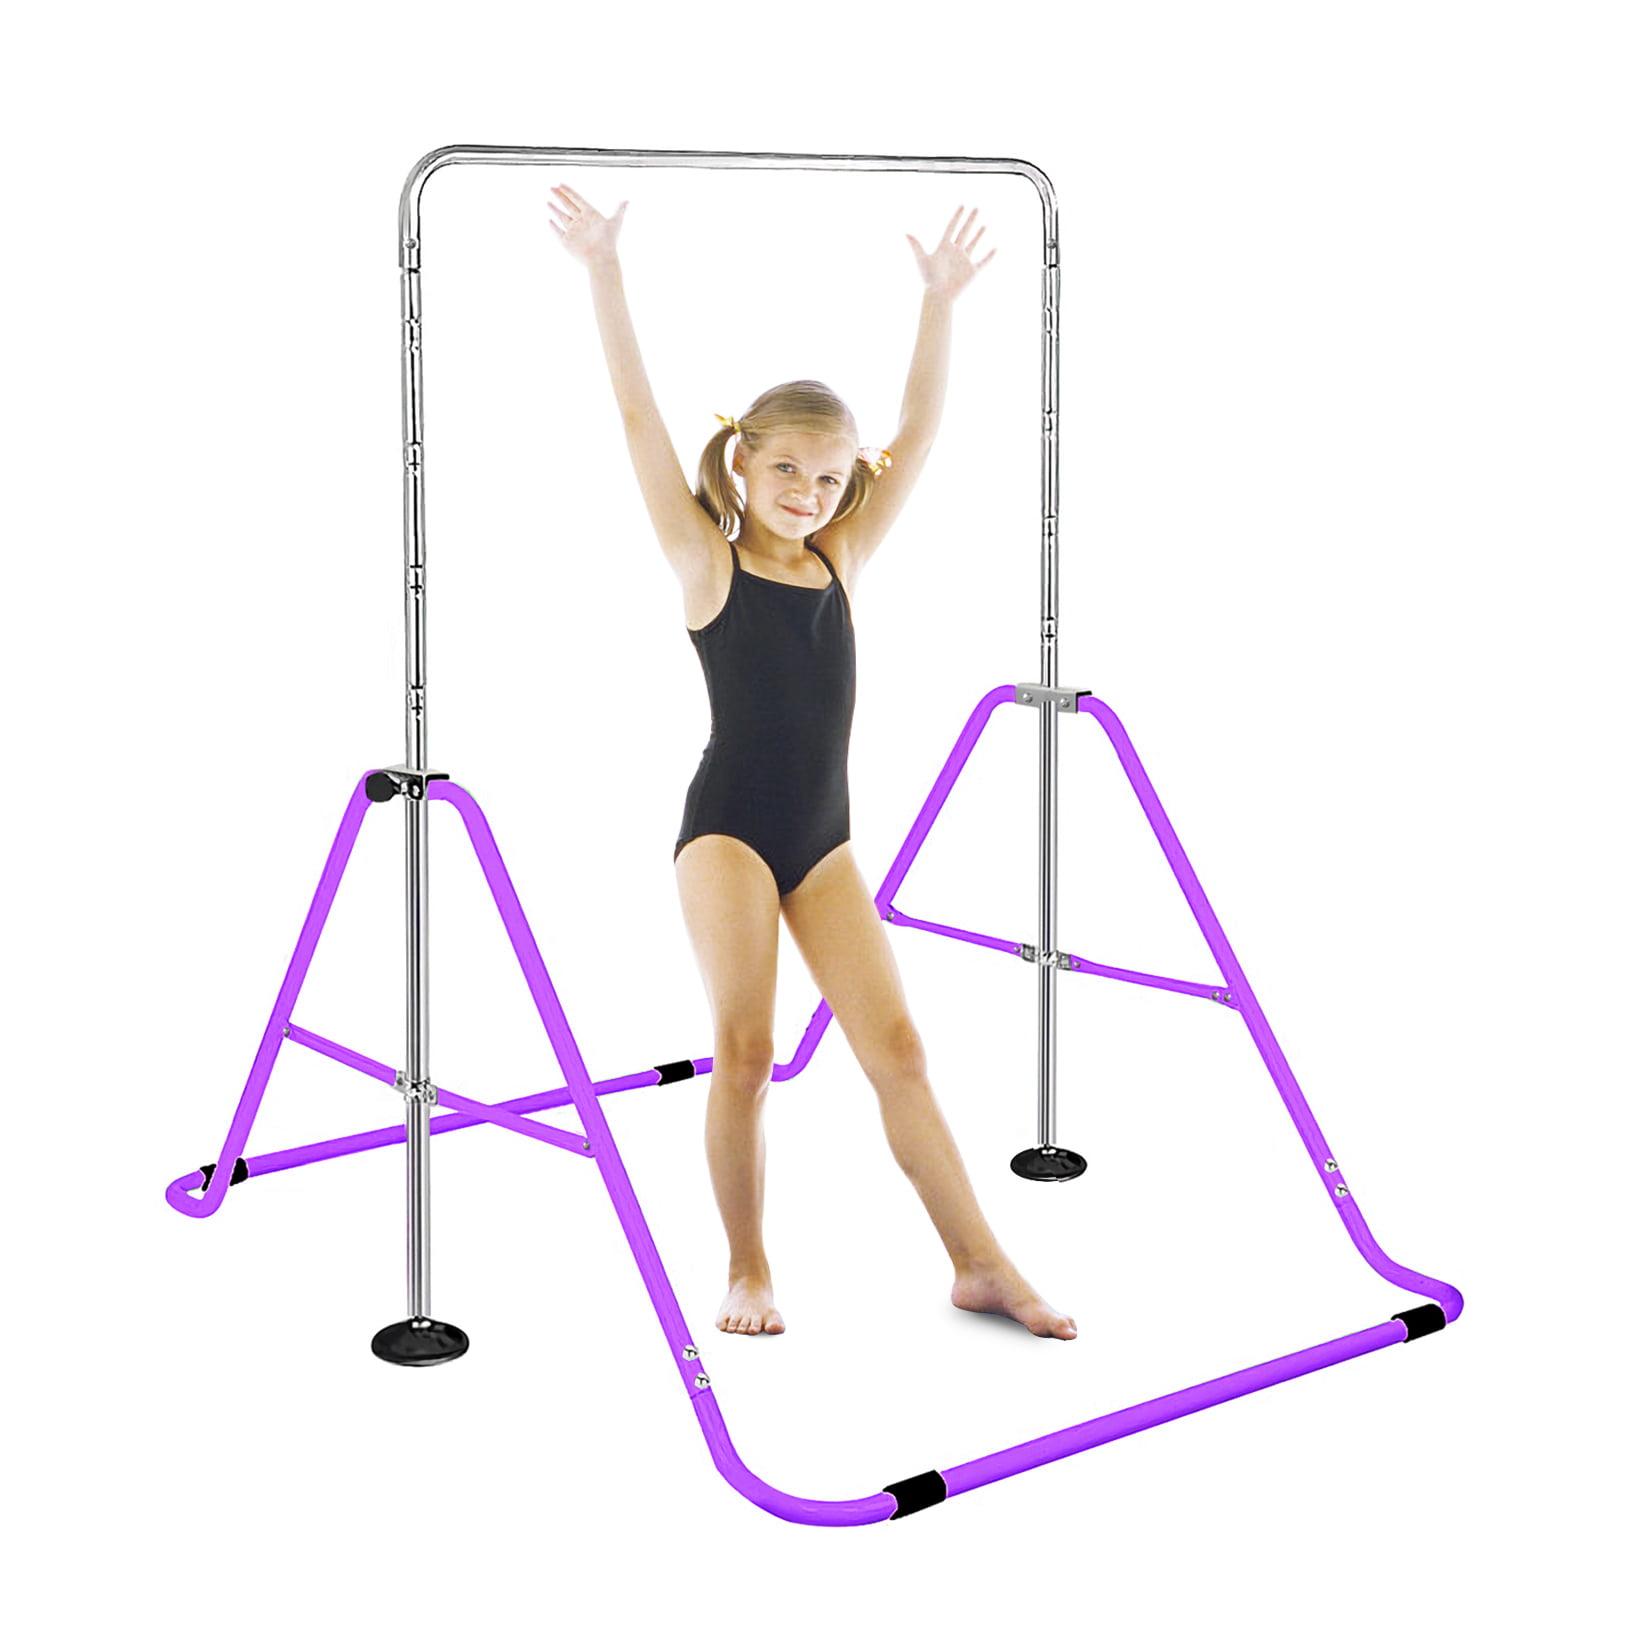 Horizontal Training Bar Gymnastics Junior Kip Bar Kids Home Gym Sport Adjustable